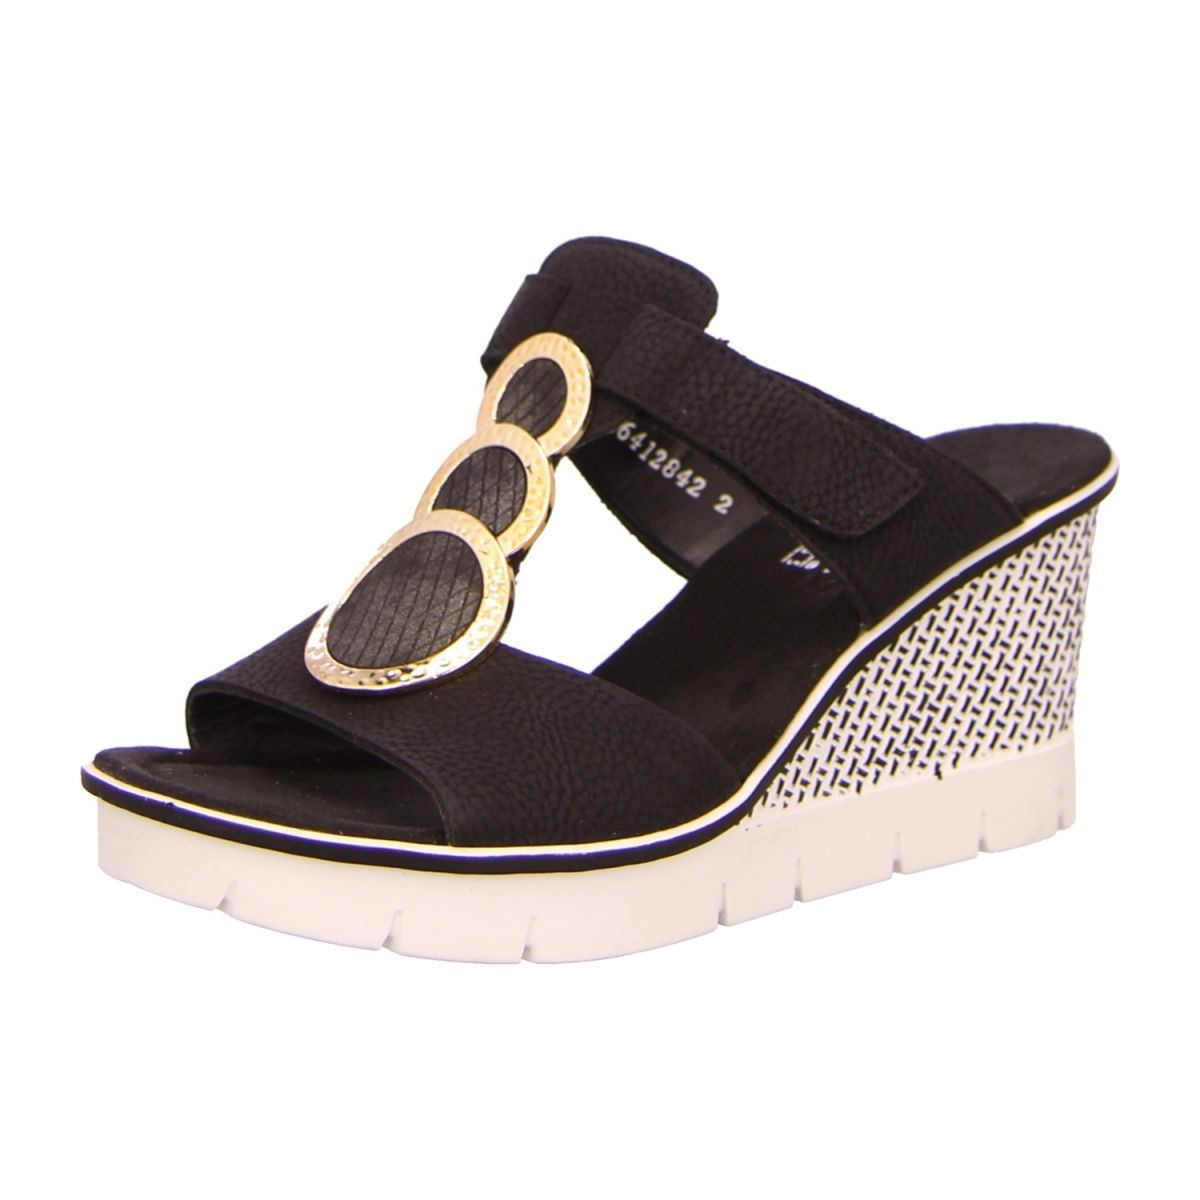 NEU: Rieker Sandaletten 68563 00 schwarz kombi   Shoes